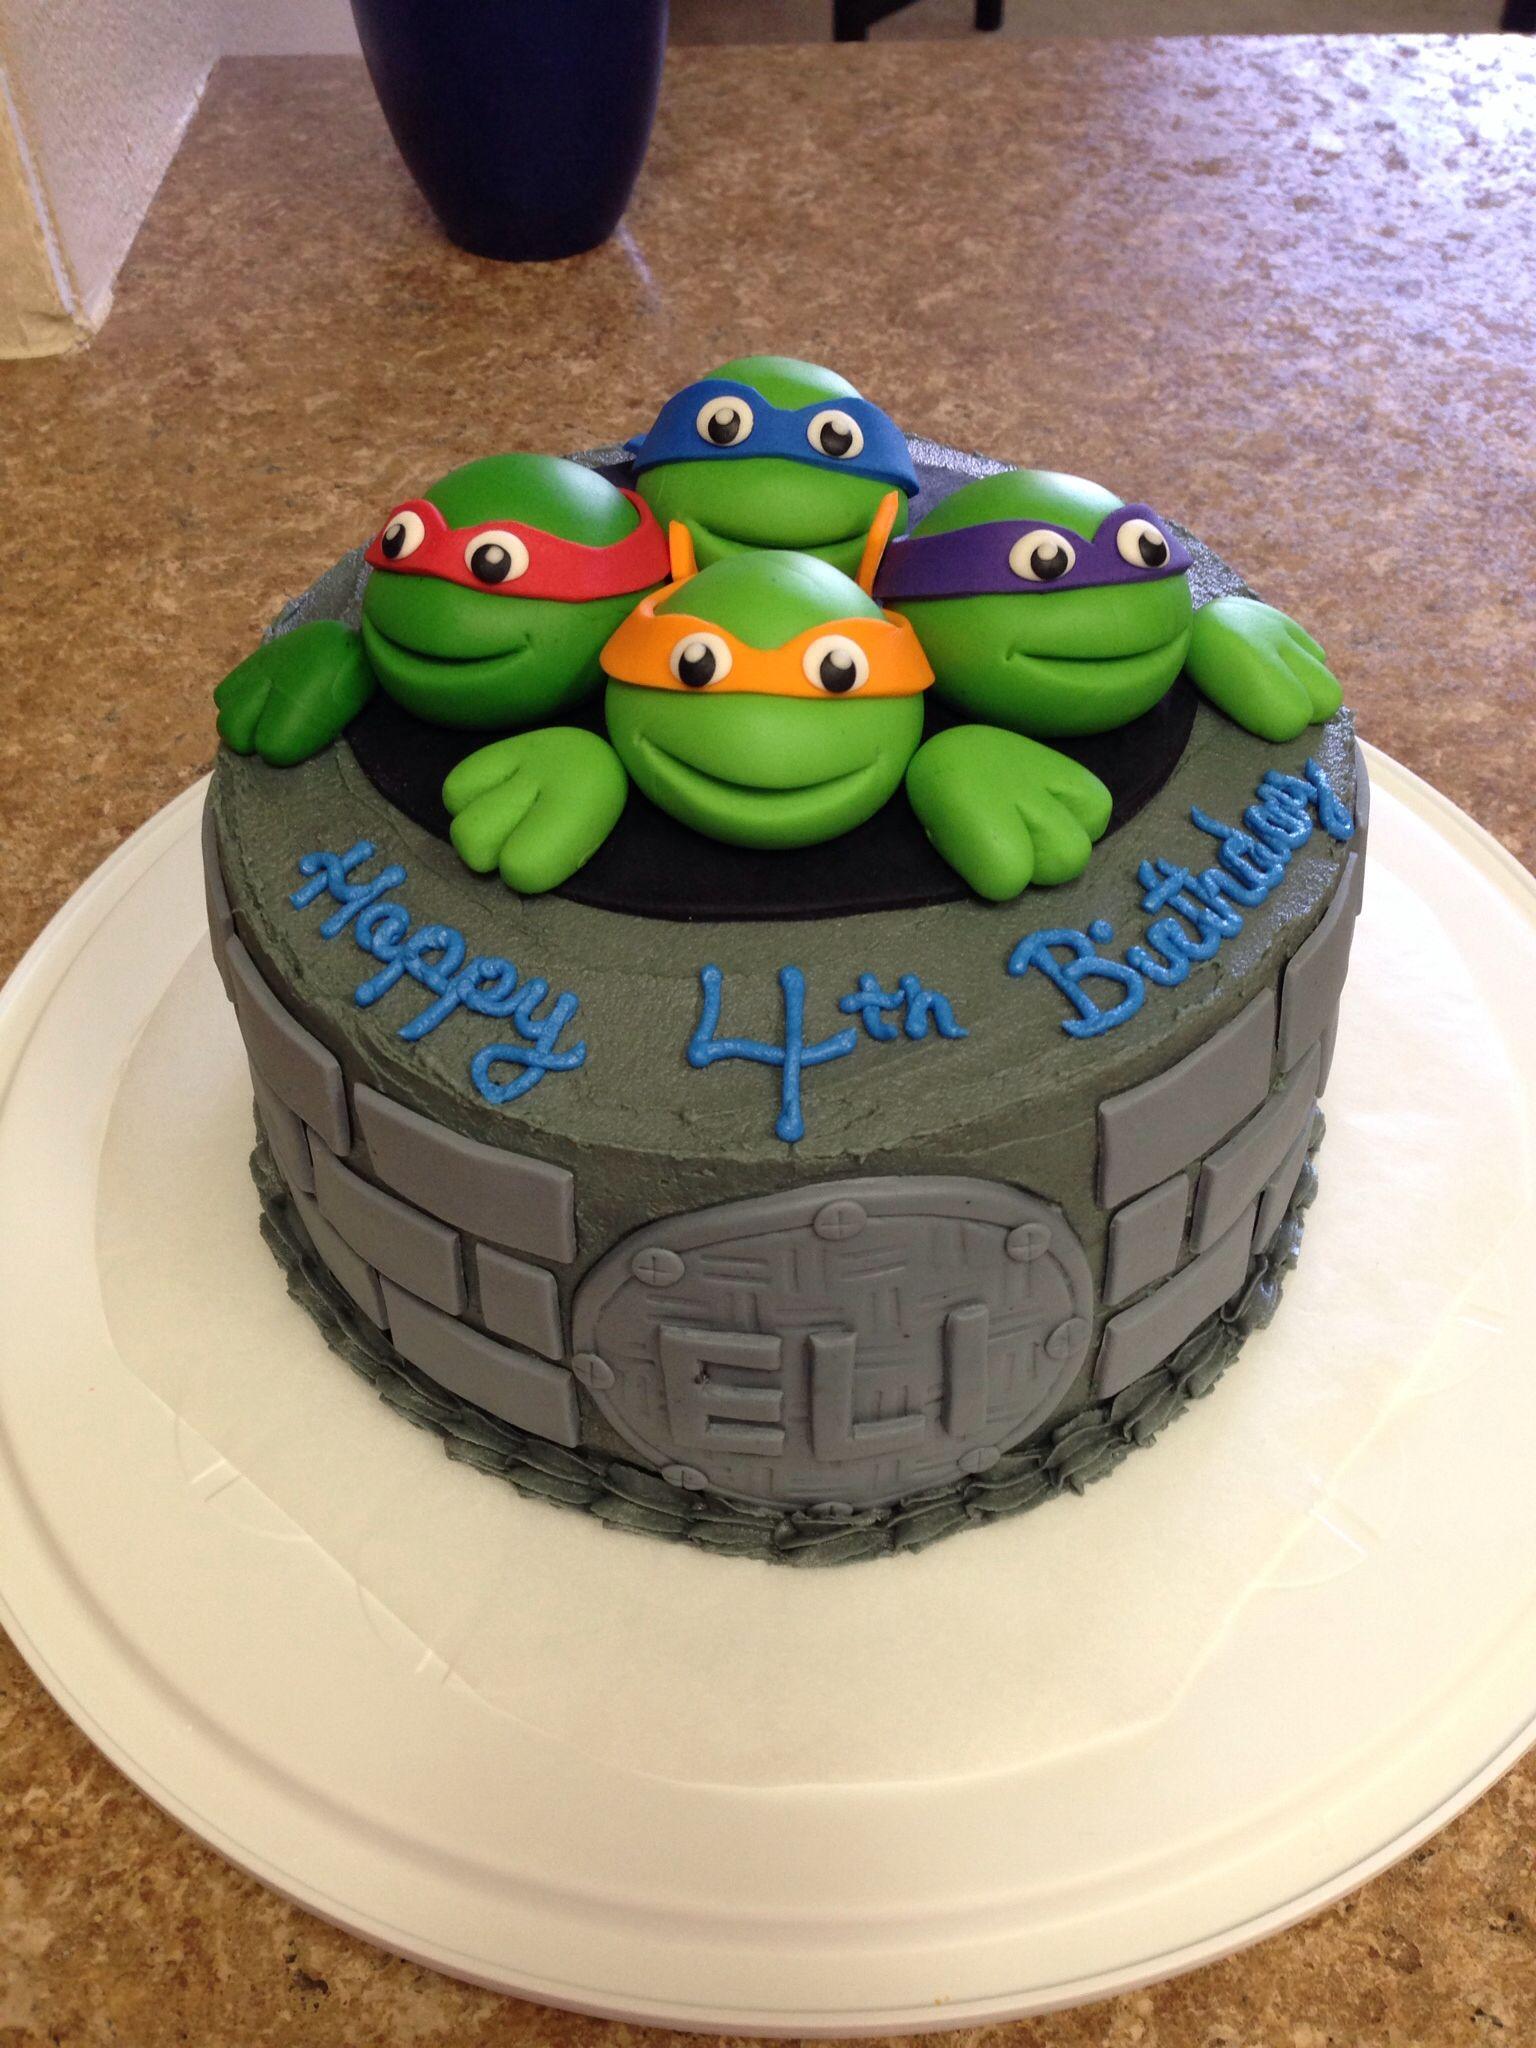 Tmnt Cake I Made For My Son S 4th Birthday I Used Fondant